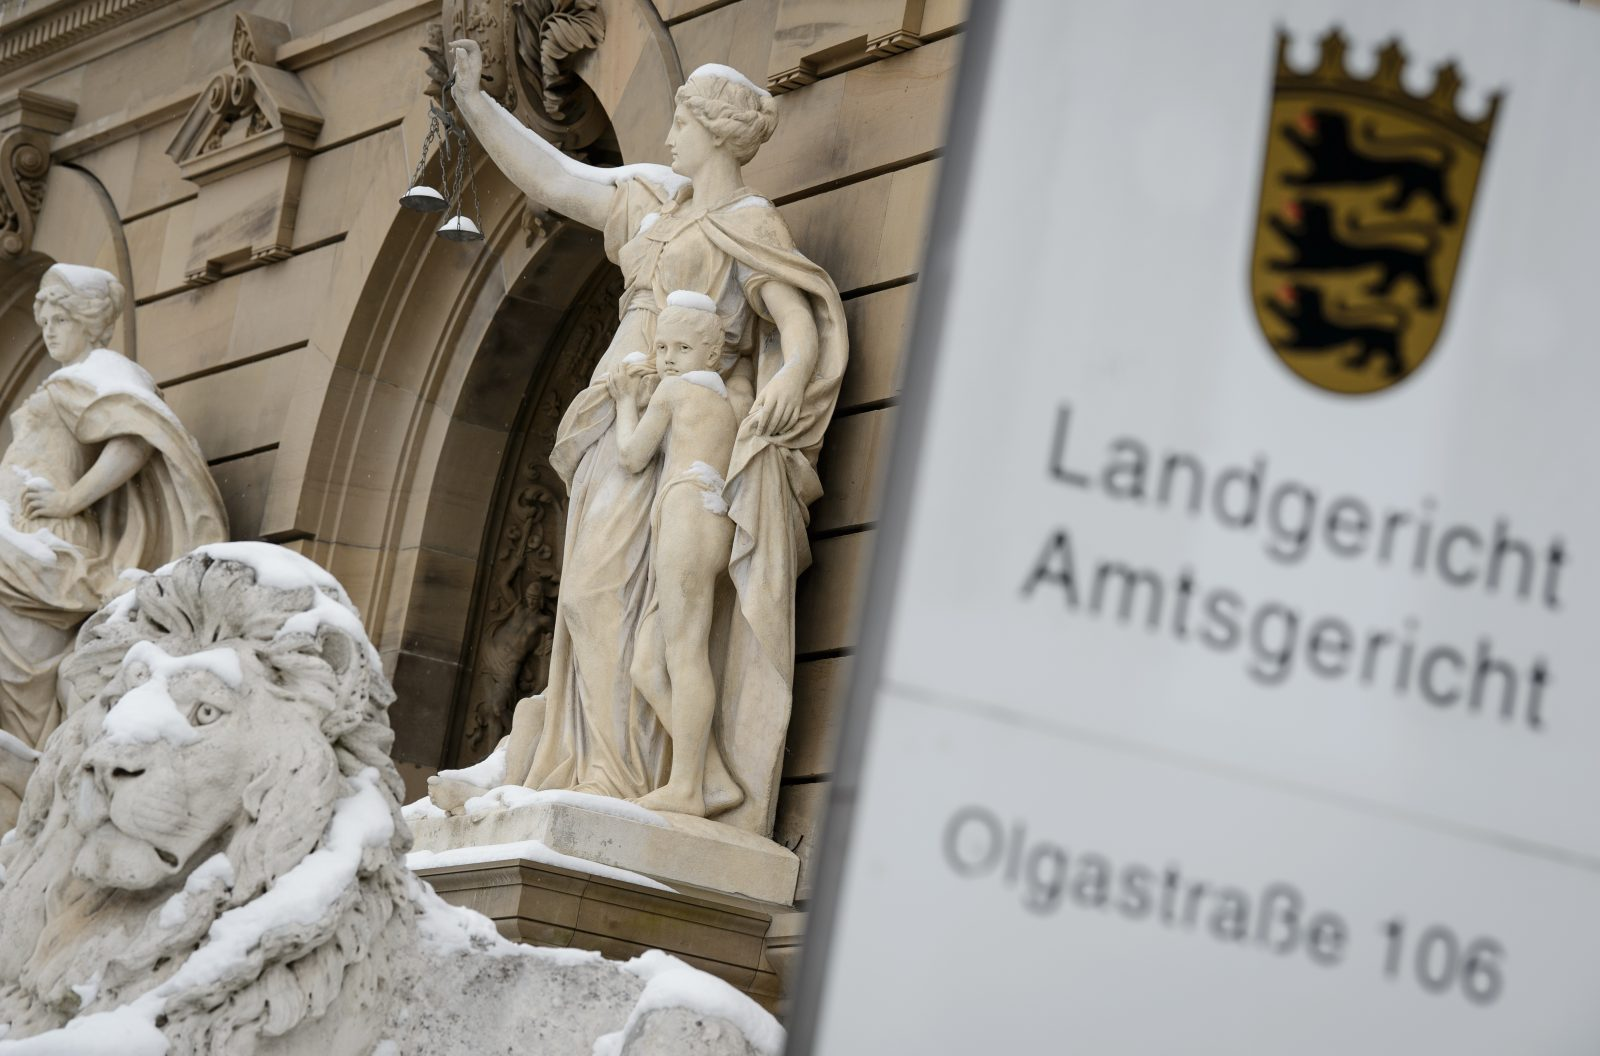 Landgericht Ulm Foto: dpa